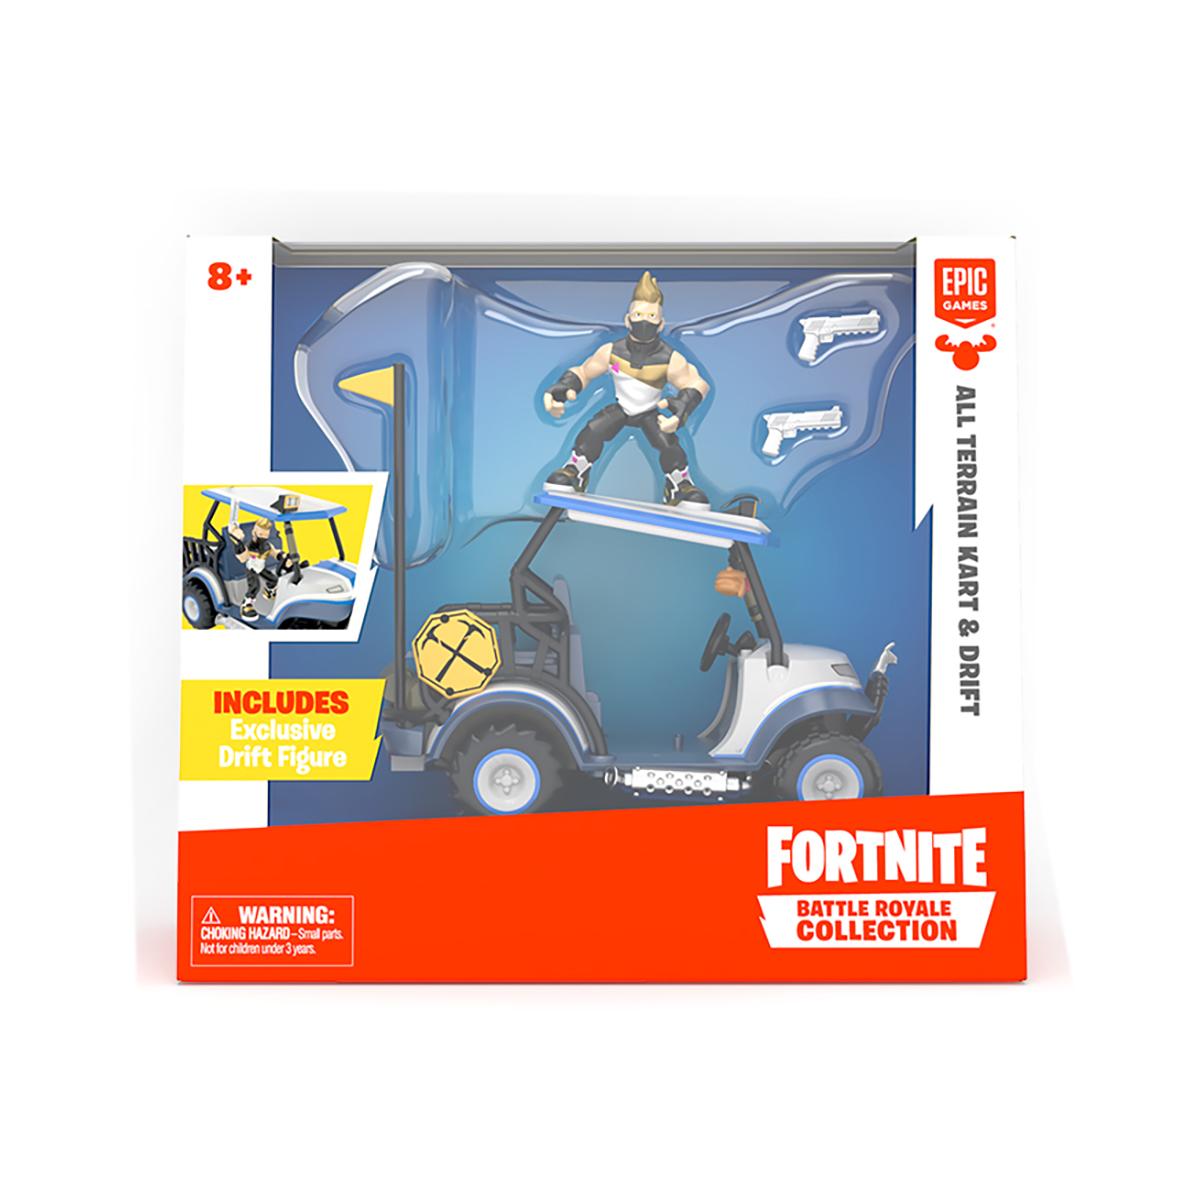 Set de joaca cu figurina si vehicul Fortnite, Kart si Drift